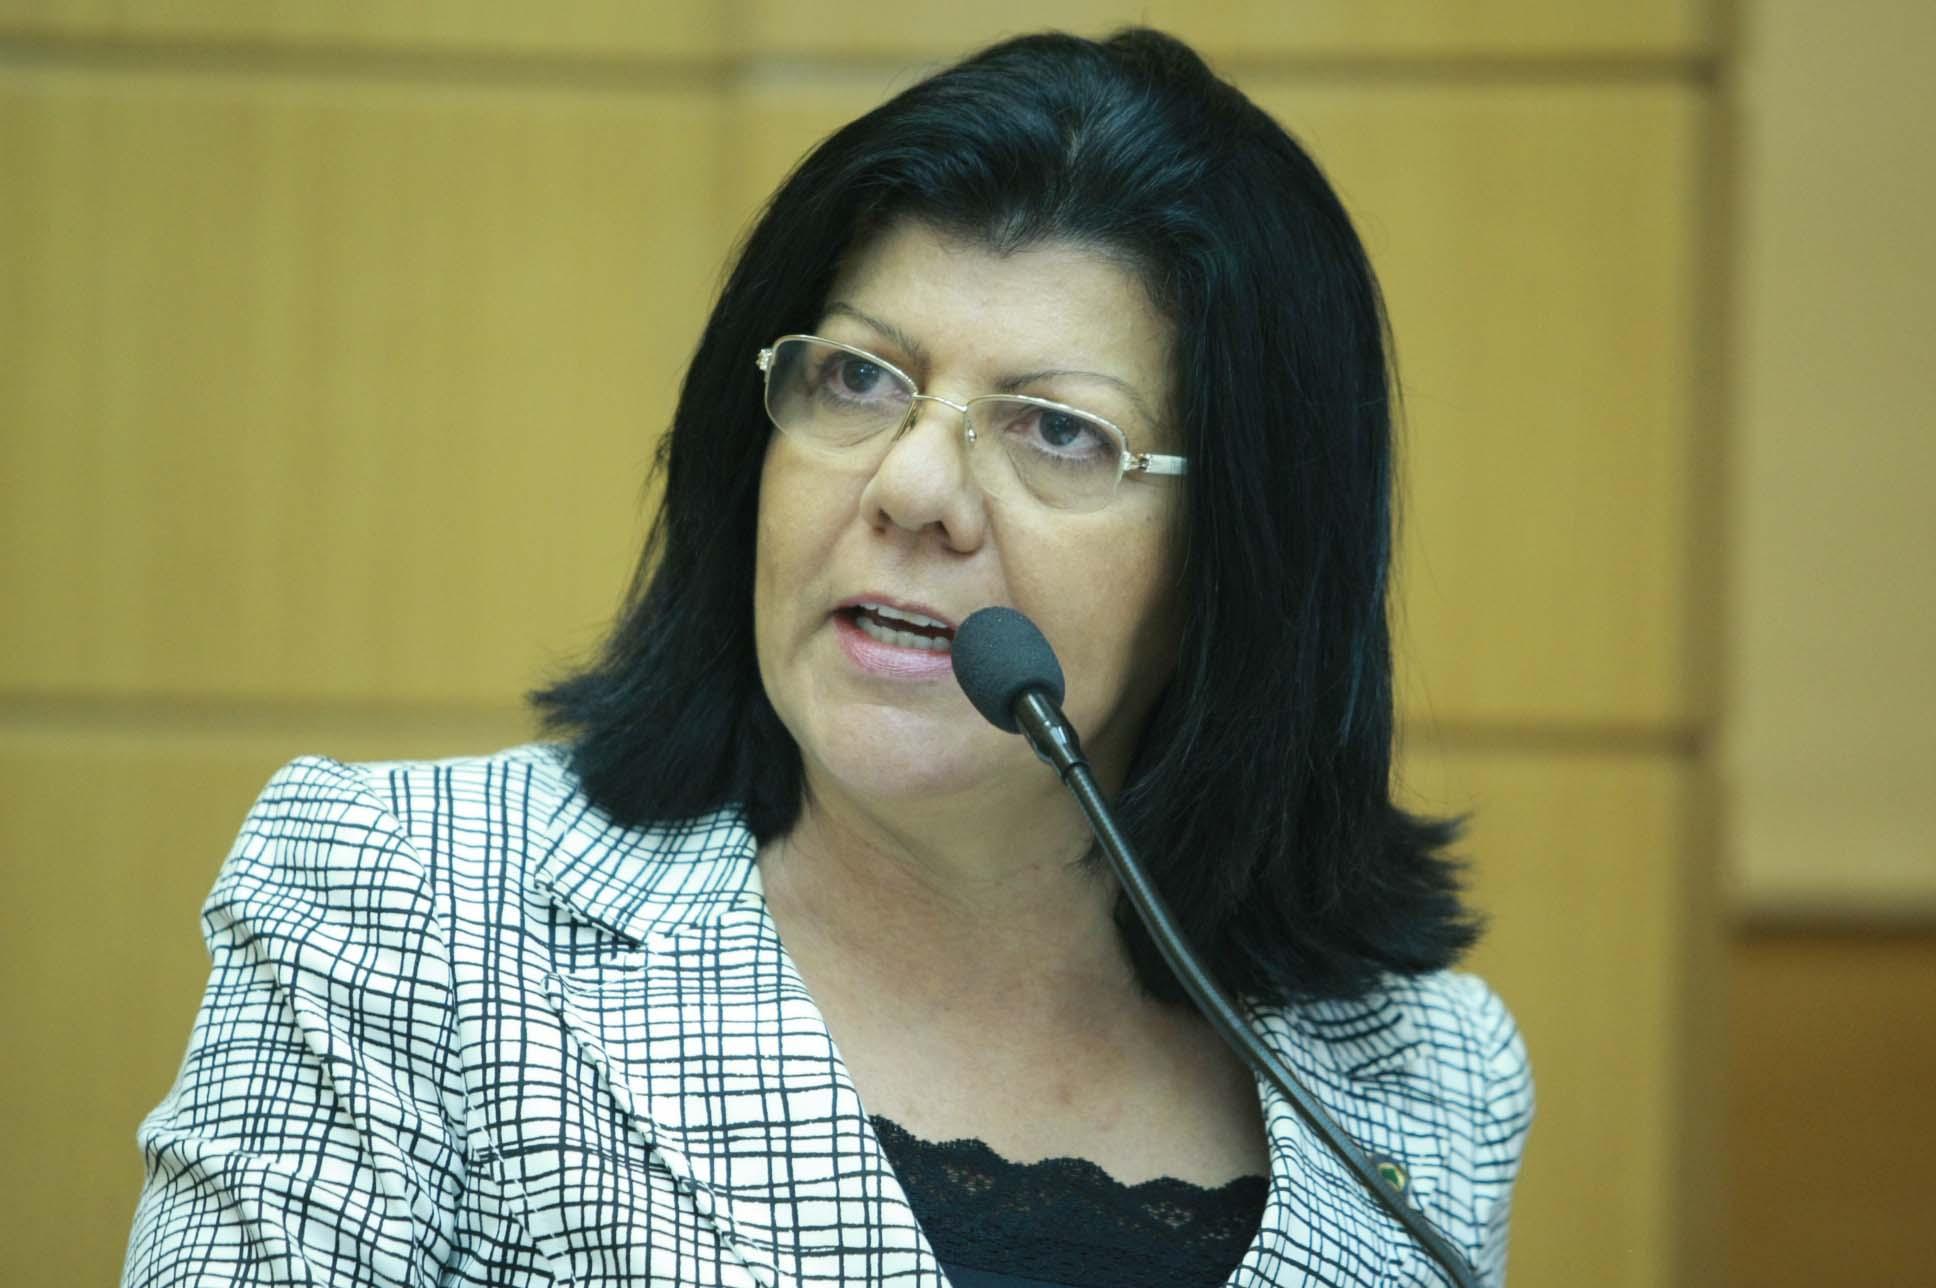 Angélica Guimarães tranquiliza servidores públicos